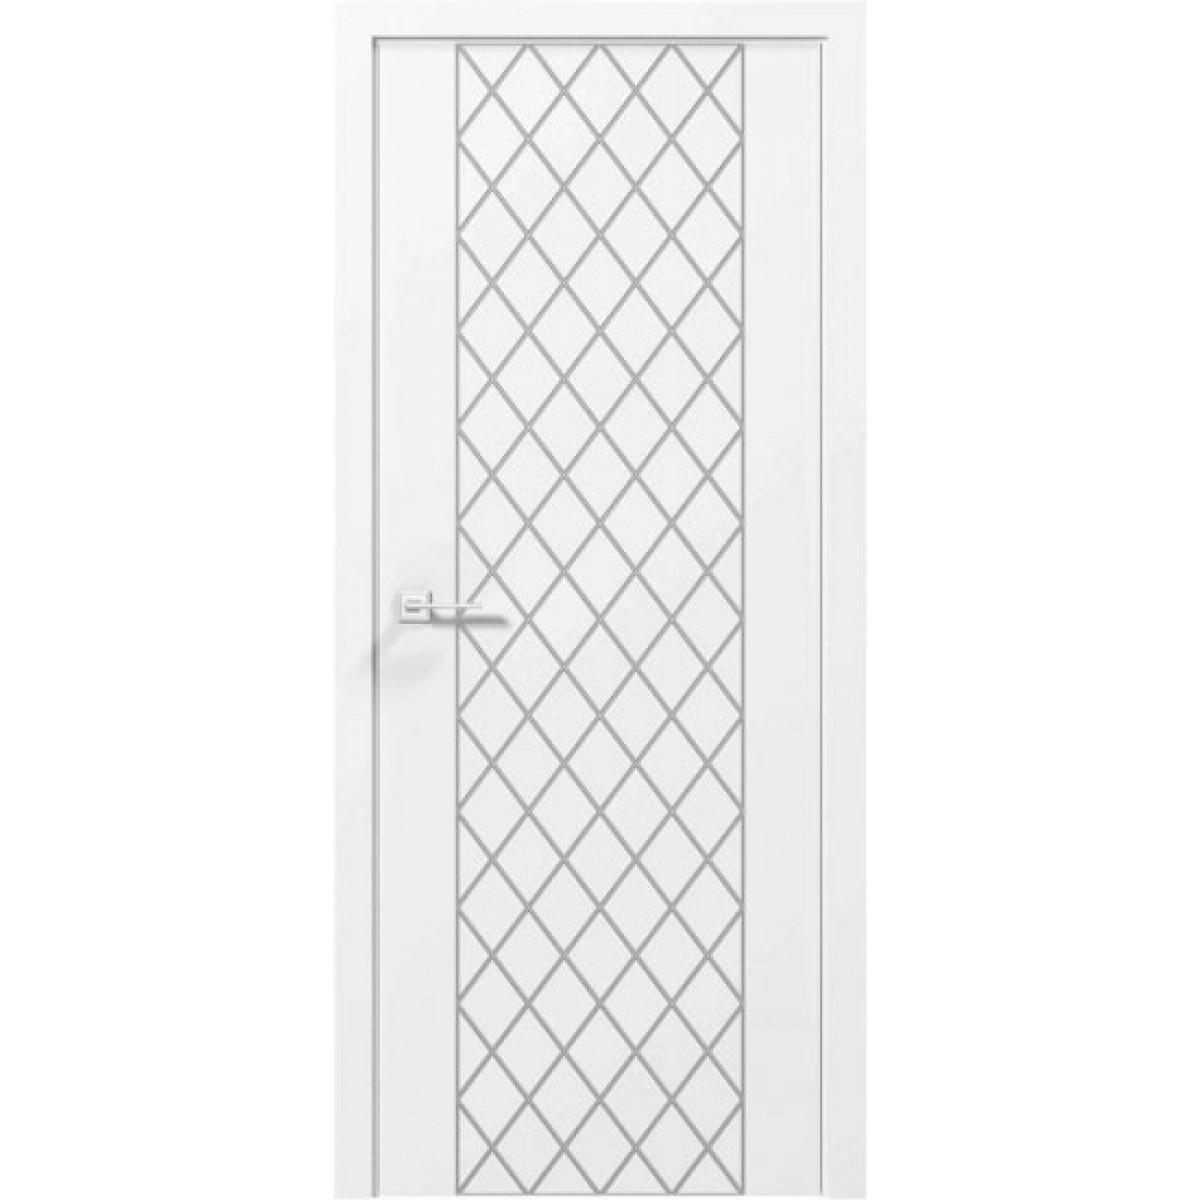 Межкомнатная дверь Cortes Tango белый мат Rodos